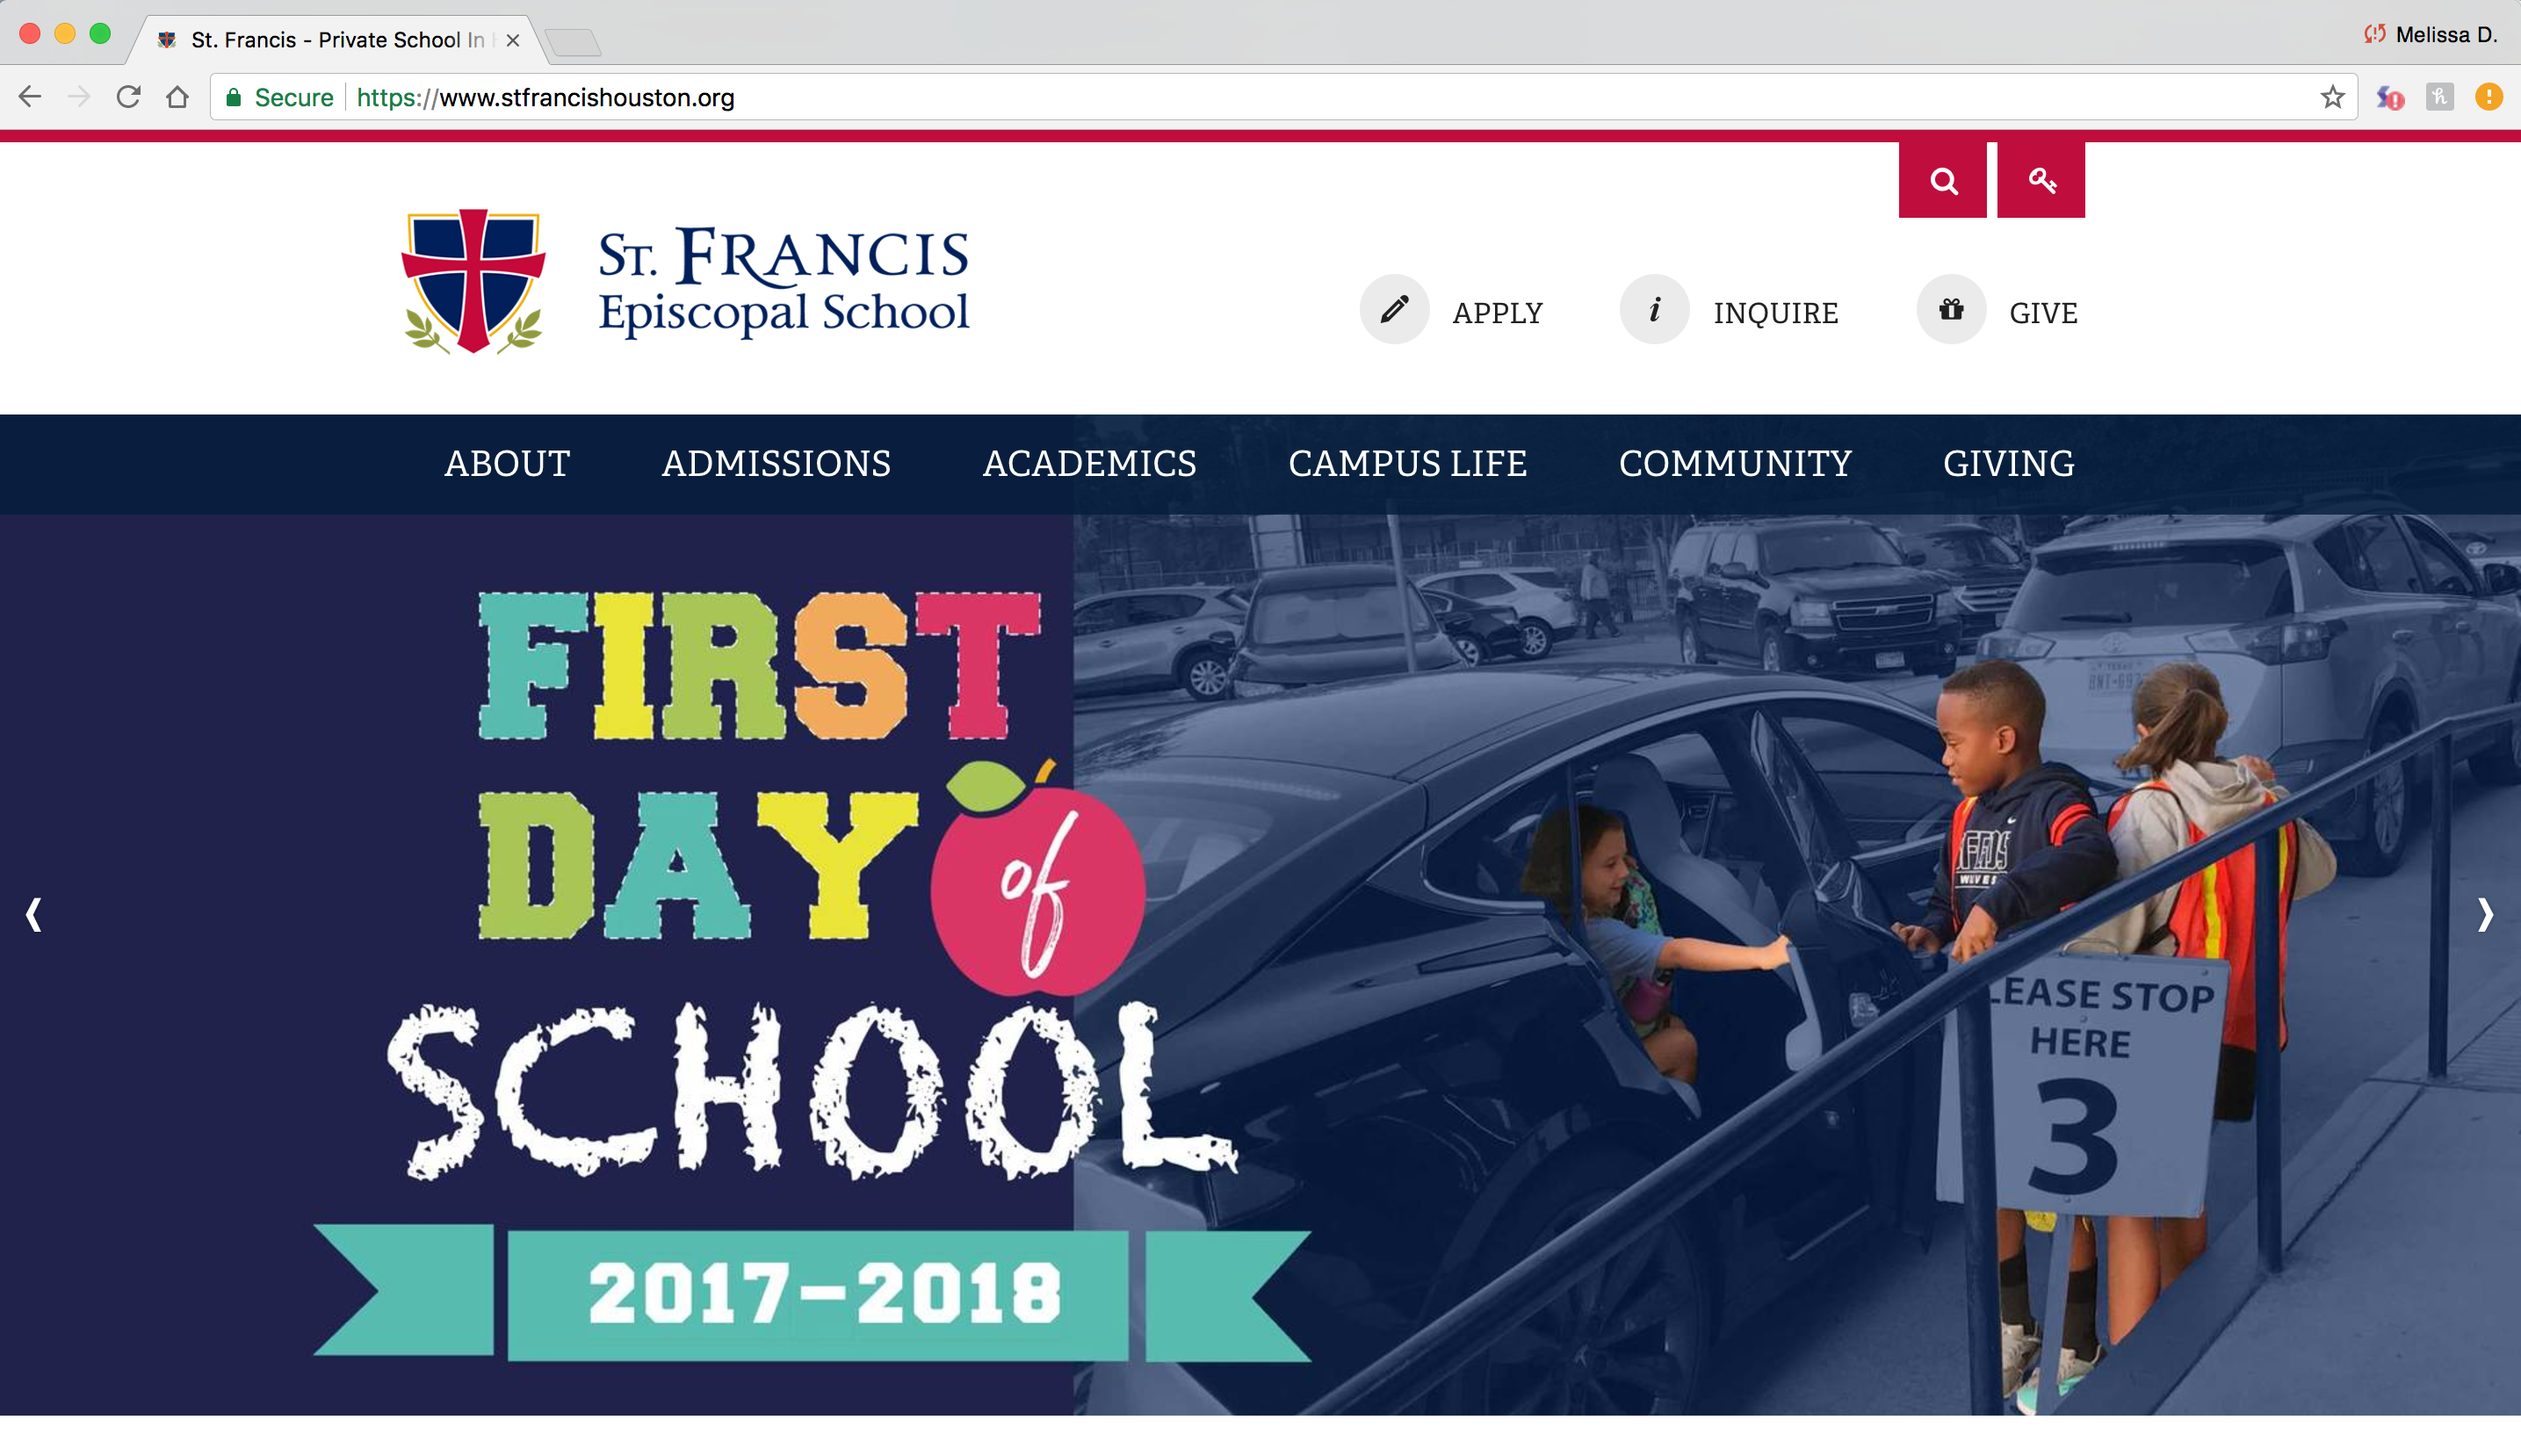 St. Francis Episcopal School